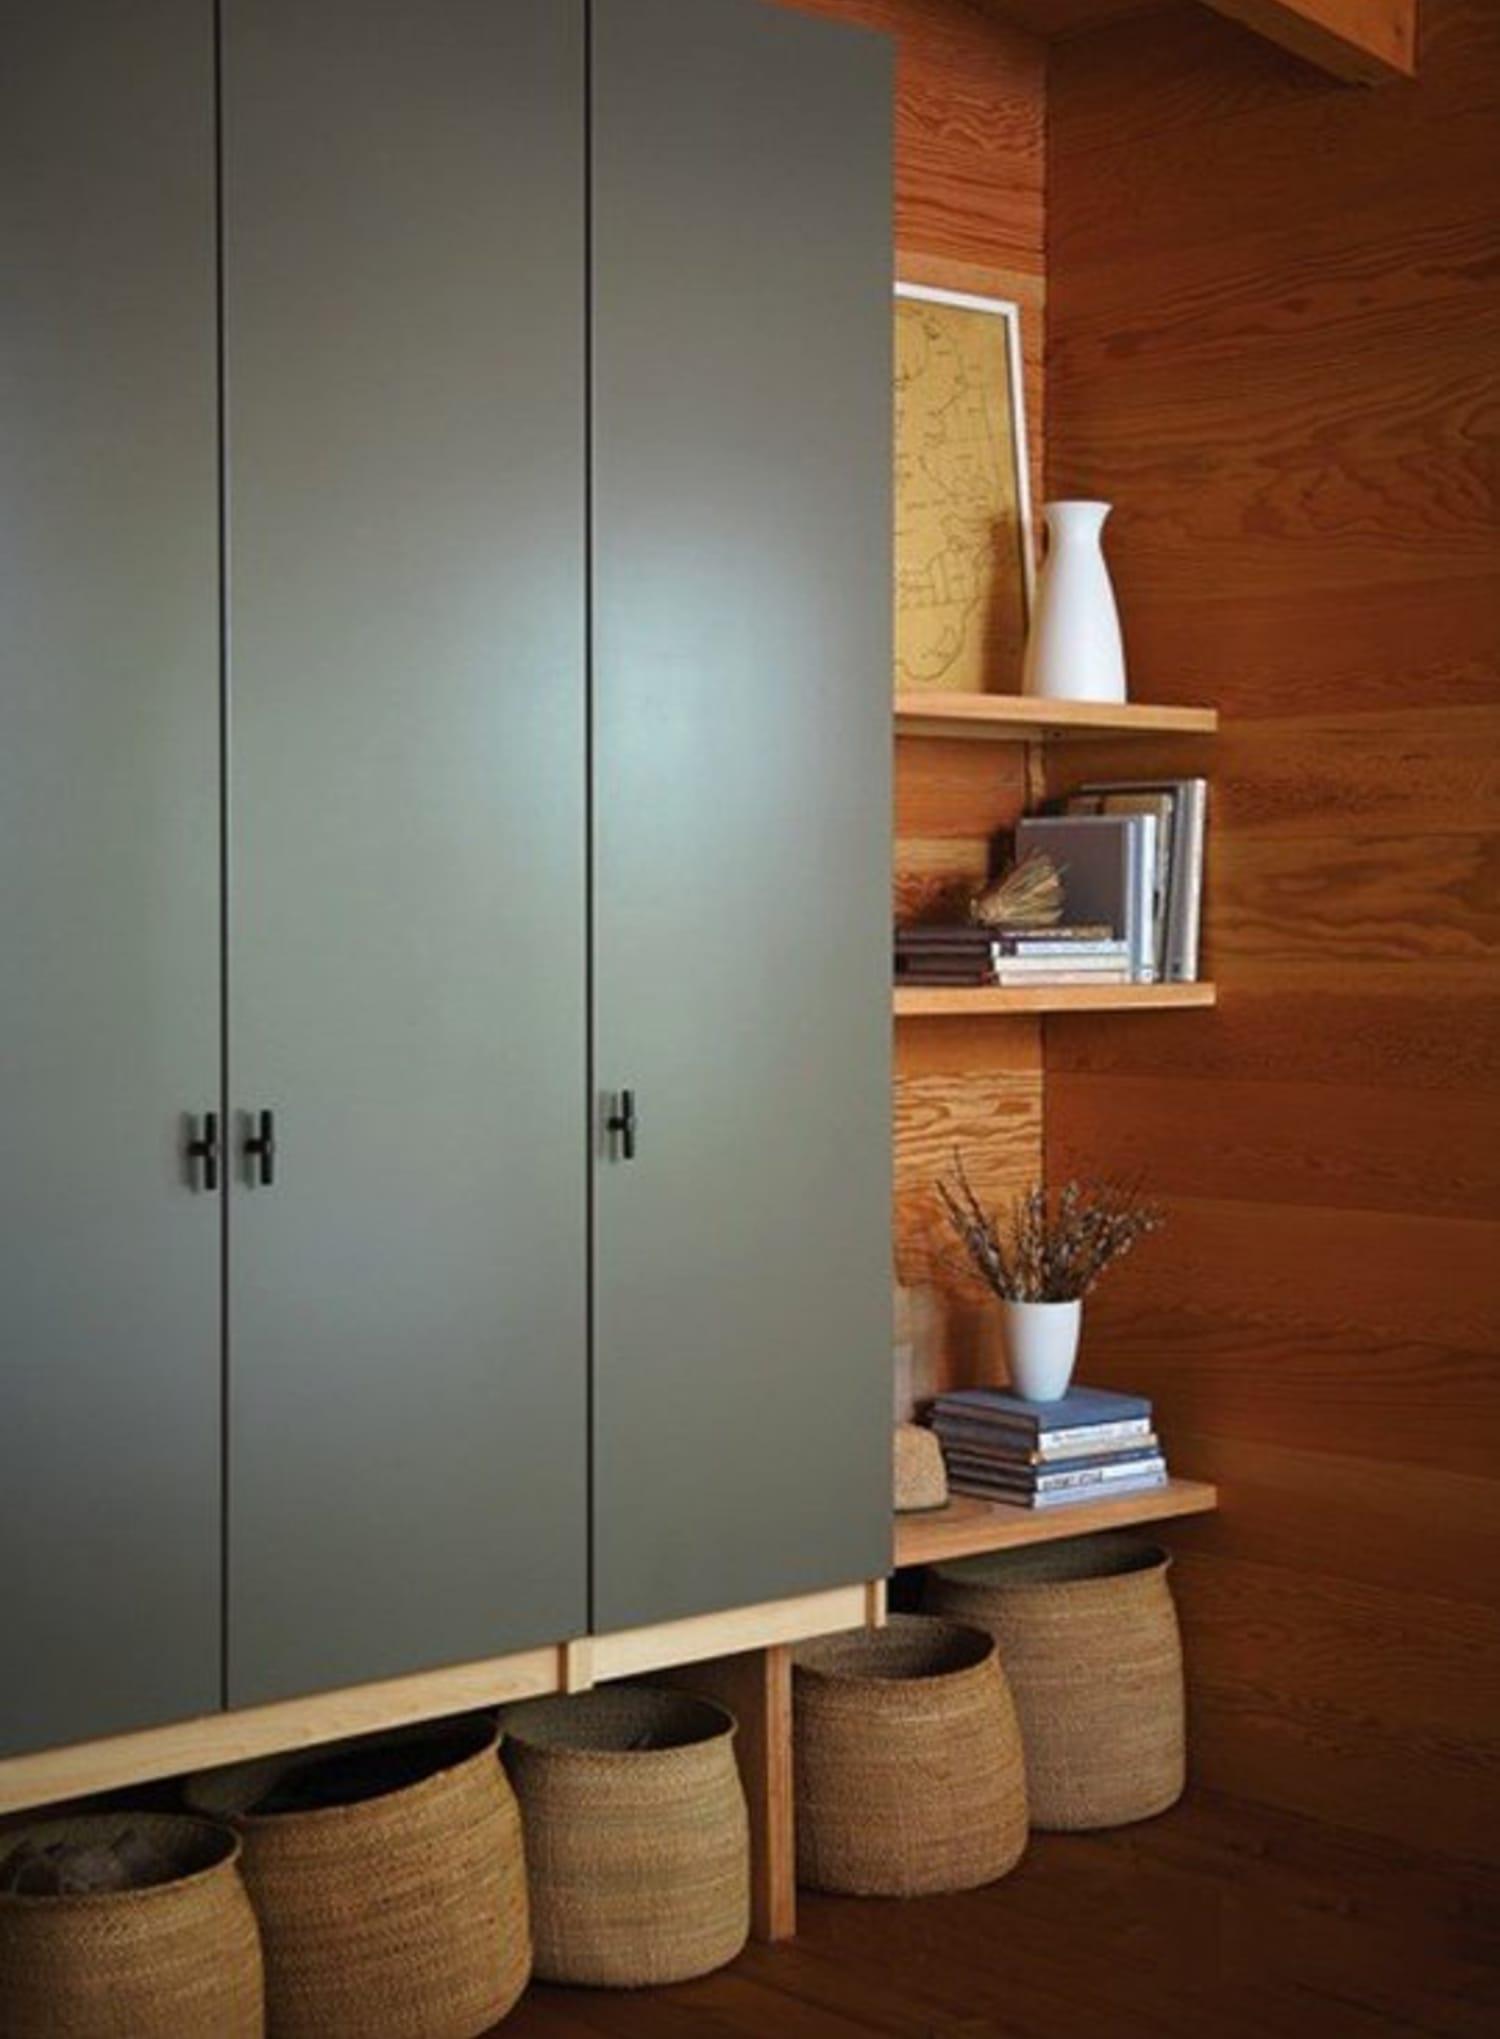 Ikea Garderobekast Pax Bergsbo.Ikea Hacks Diy Ways To Make Cheap Wardrobes Look More Expensive